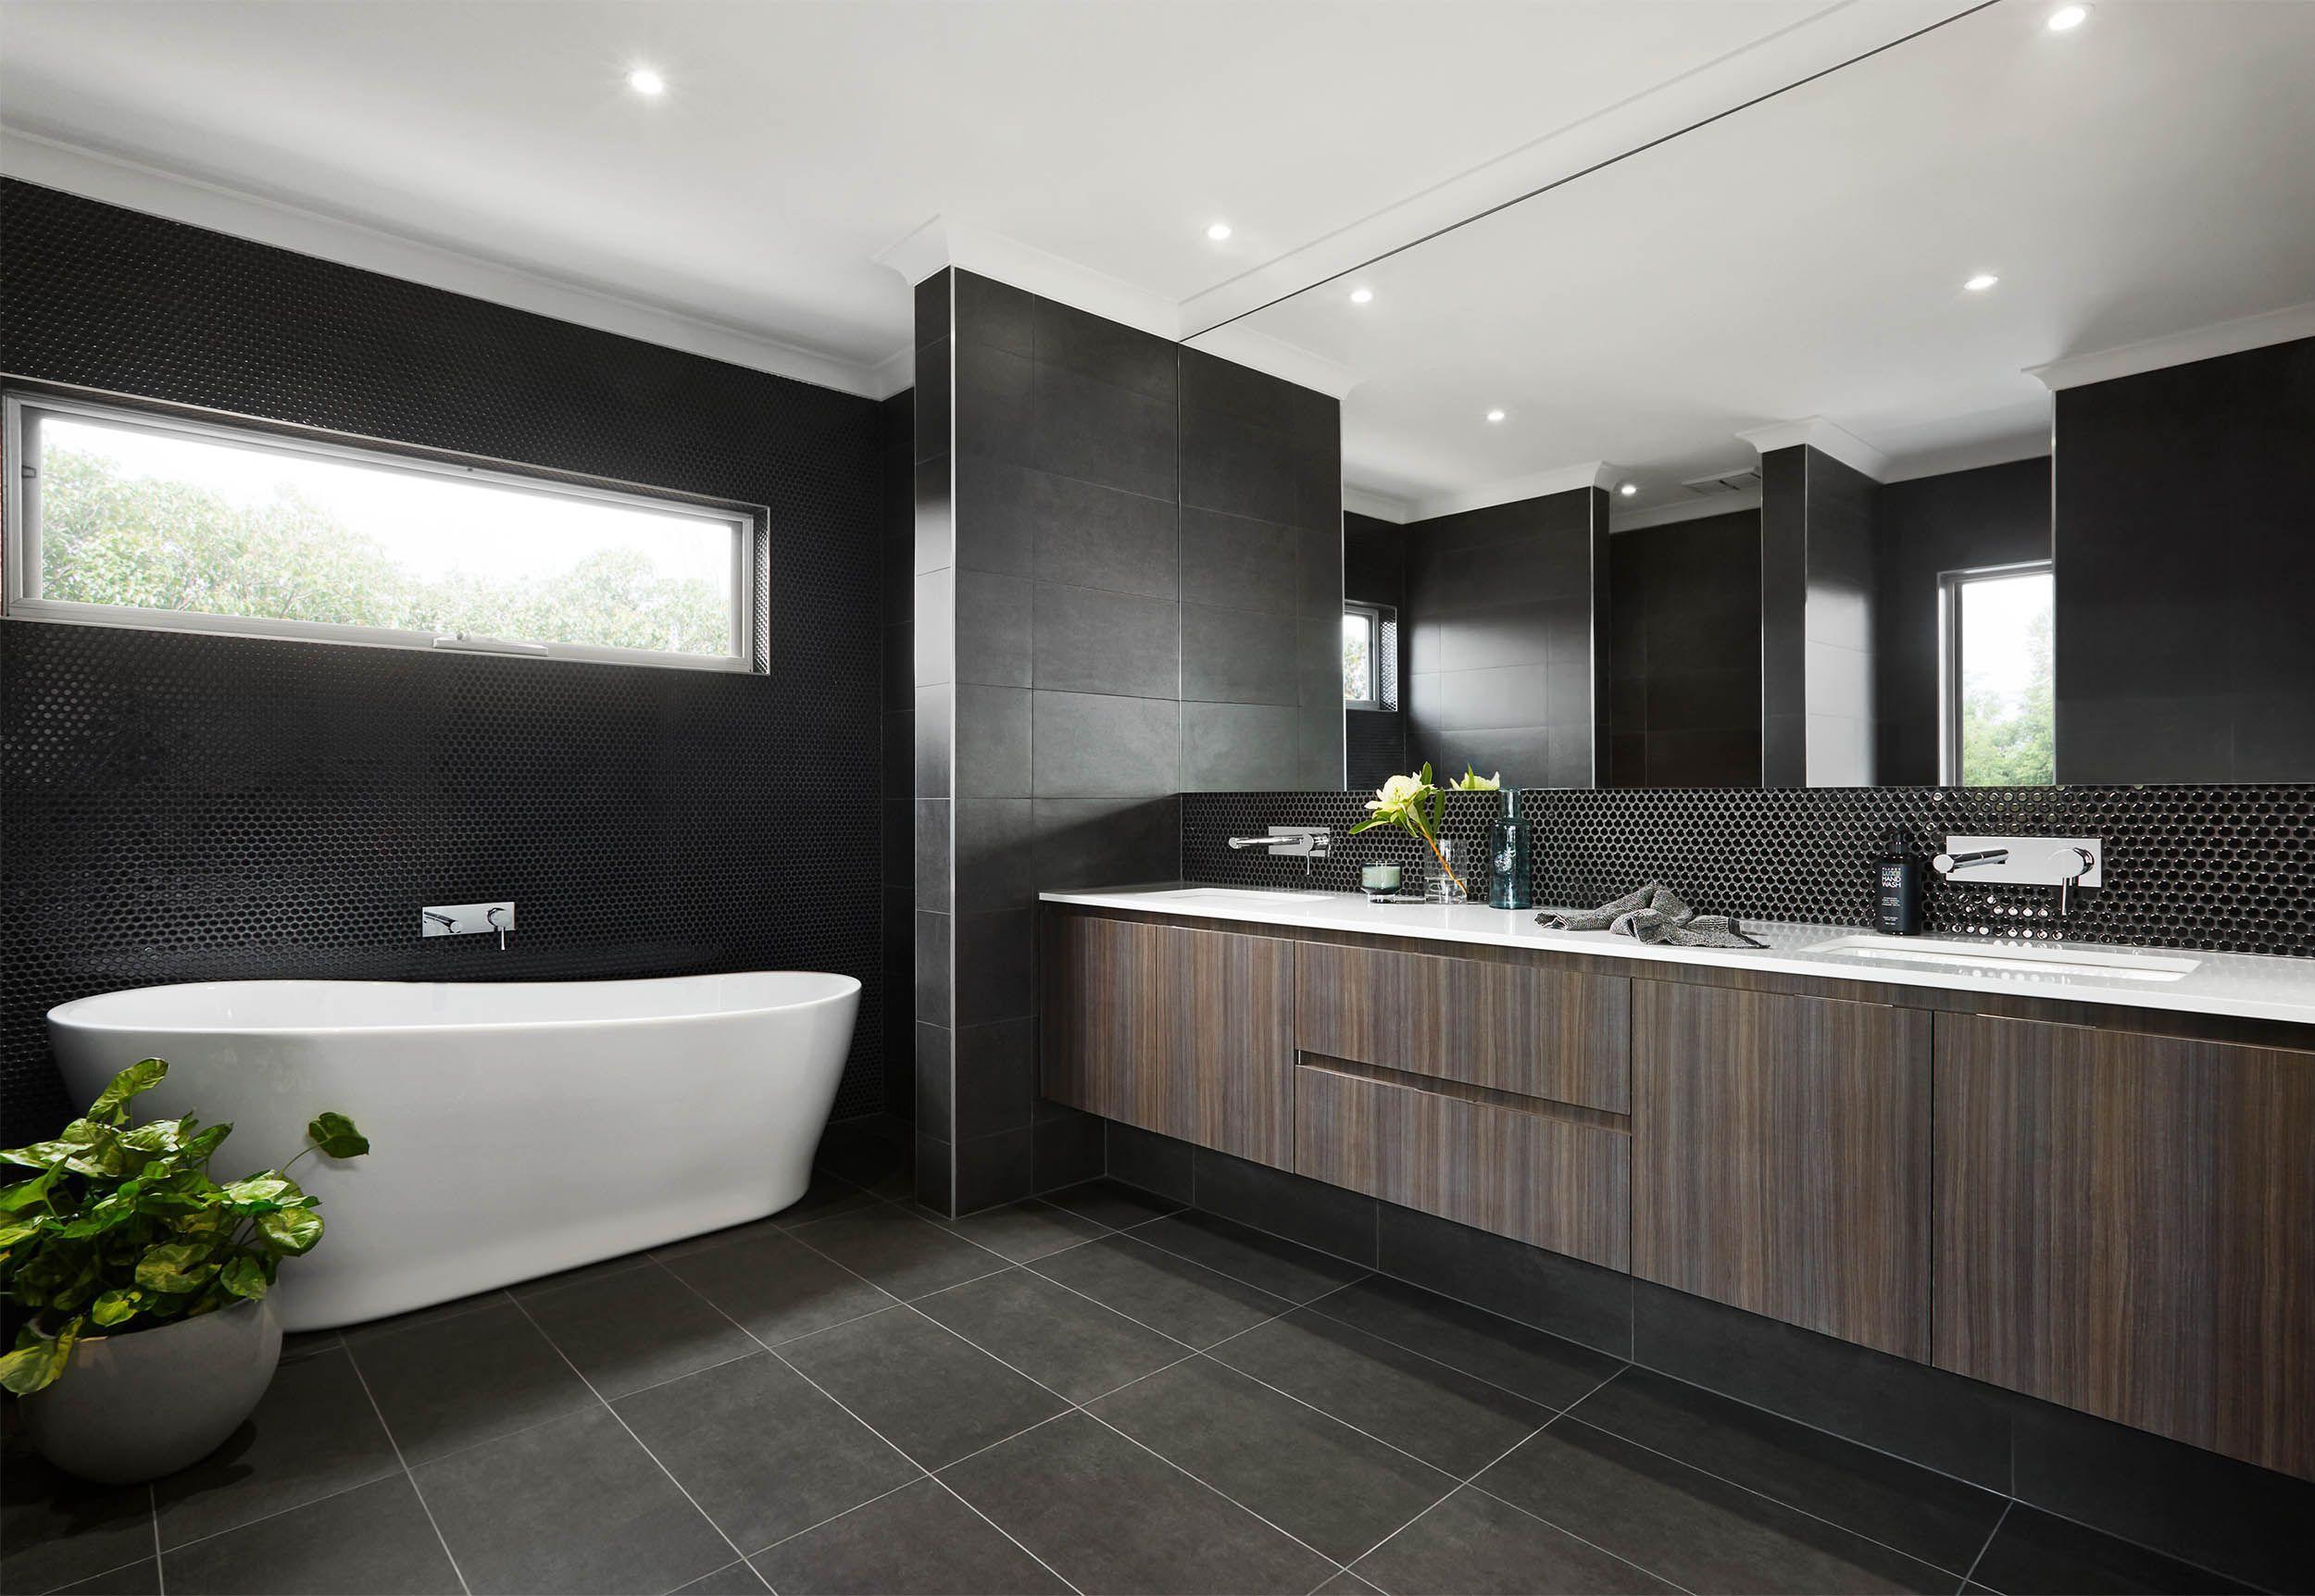 Essendon 41 ensuite. Tile bathroom, Oak bathroom, Style tile